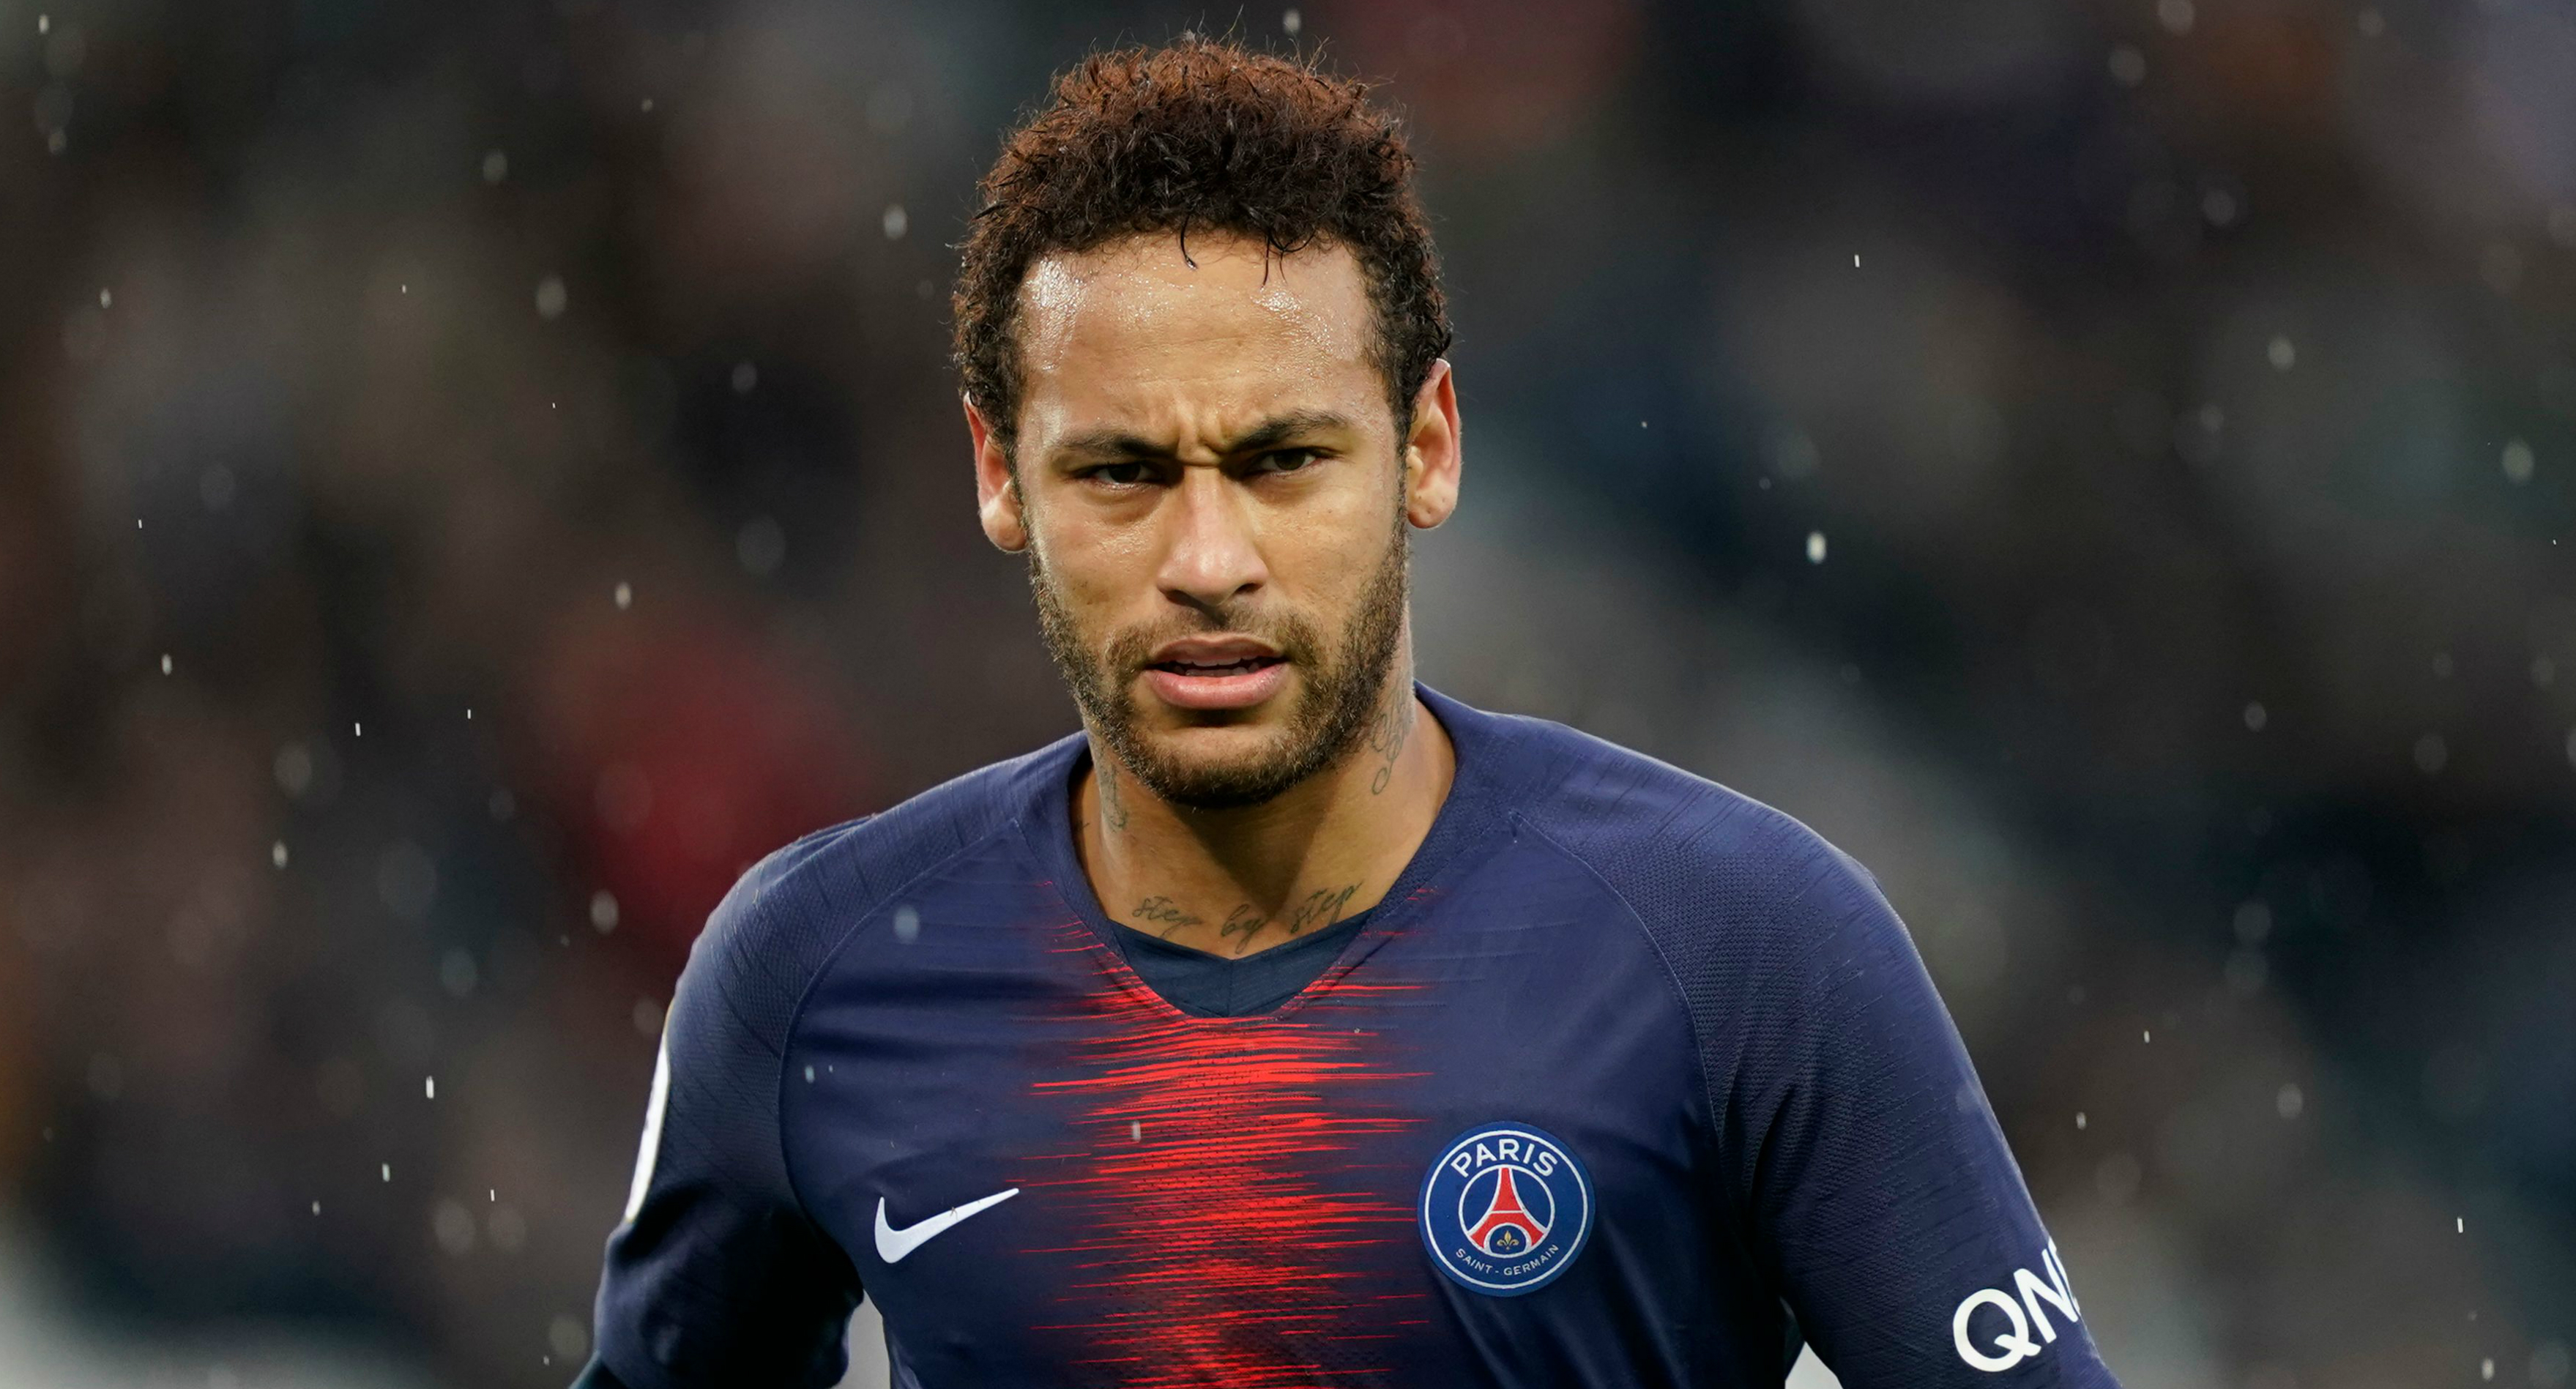 Neymar AWOL from Paris Saint-Germain training; club threatens punishment